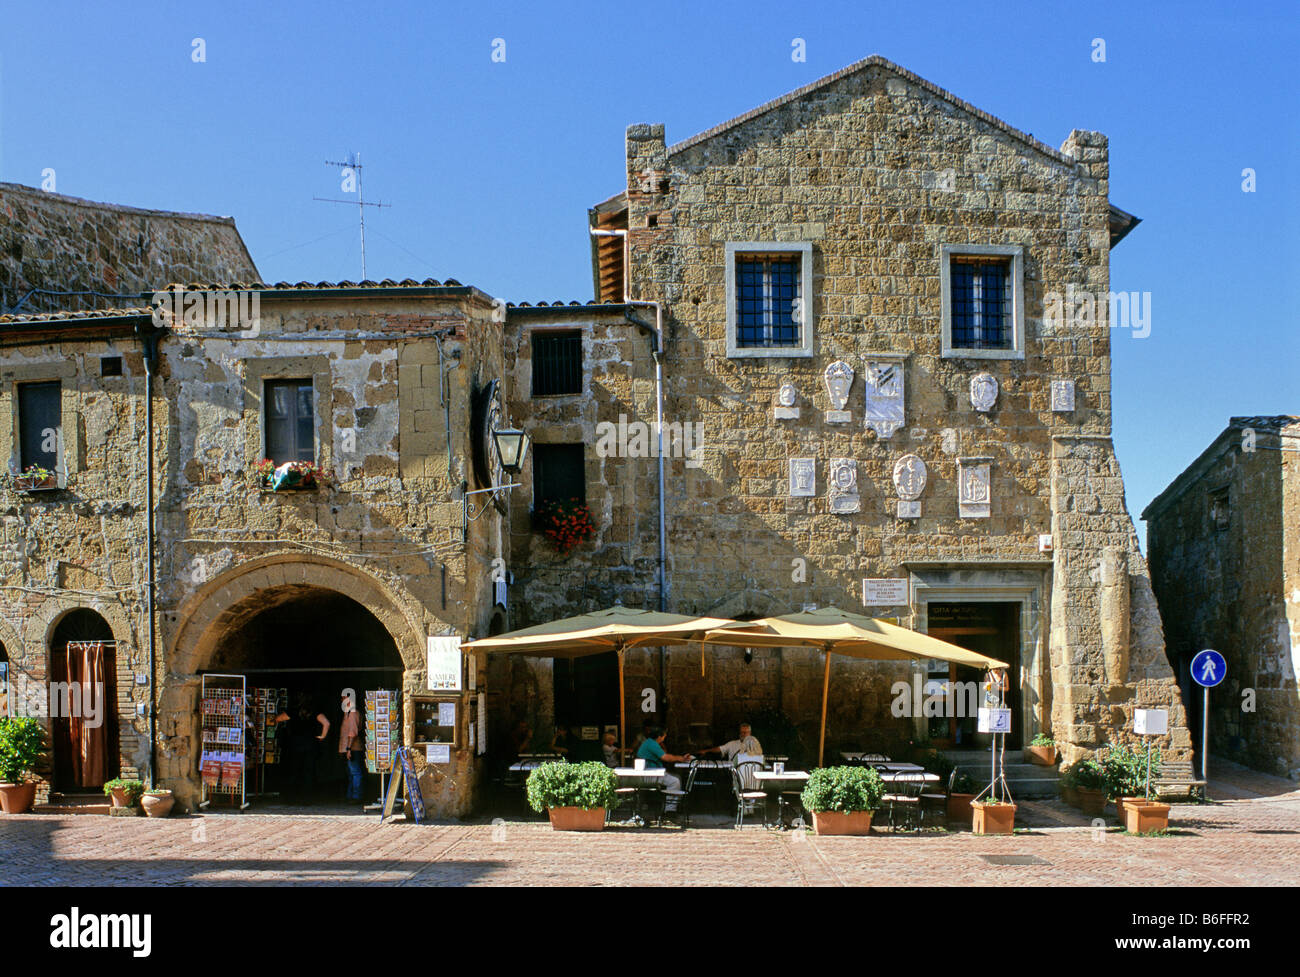 Palazzo Pretorio, Sovana, Grosseto province, Tuscany, Italy, Europe - Stock Image